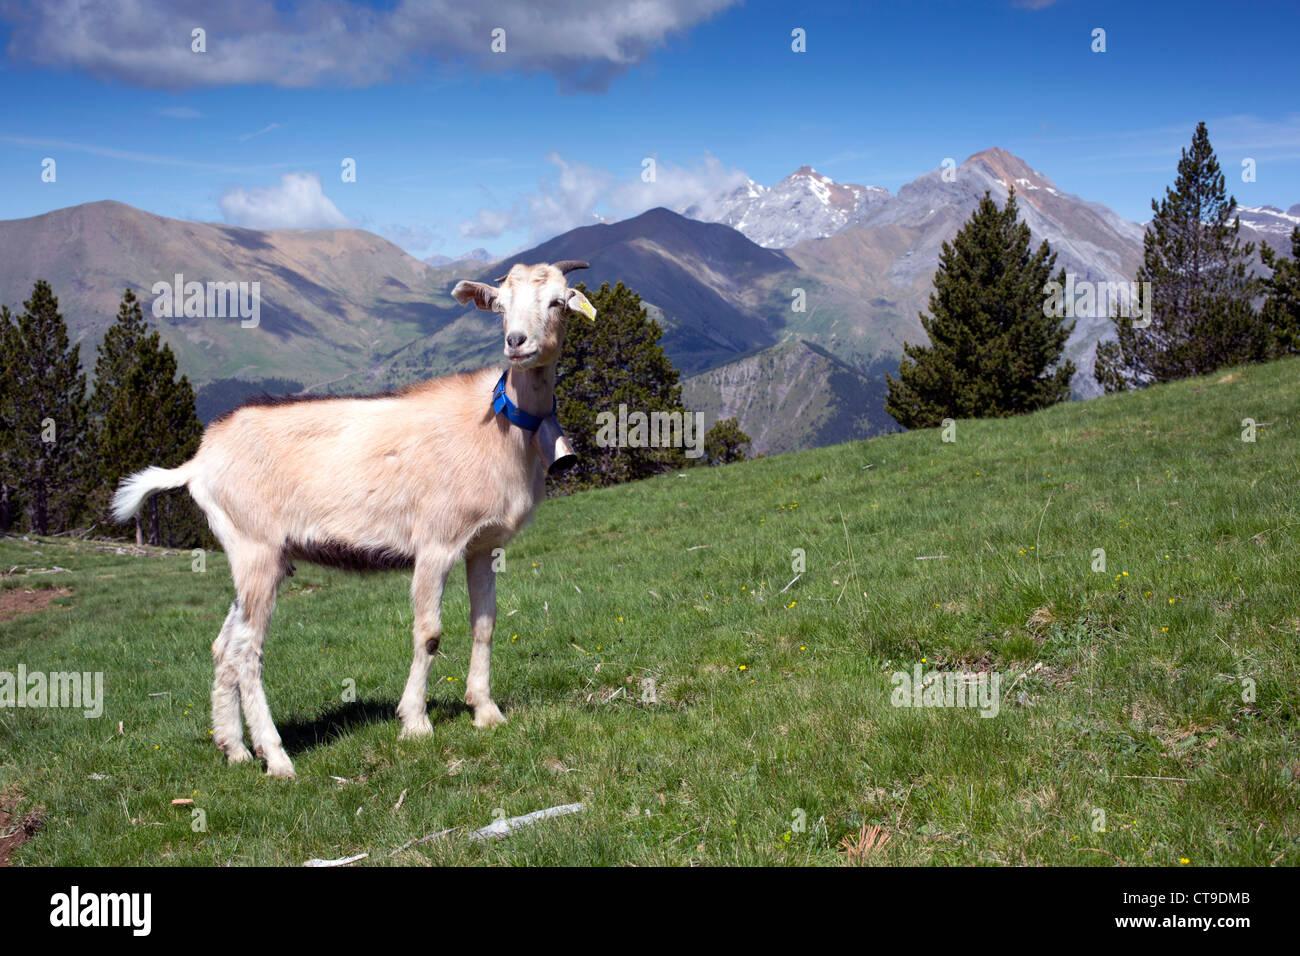 Goat; Mirador del Molar; Pyrenees; Spain - Stock Image